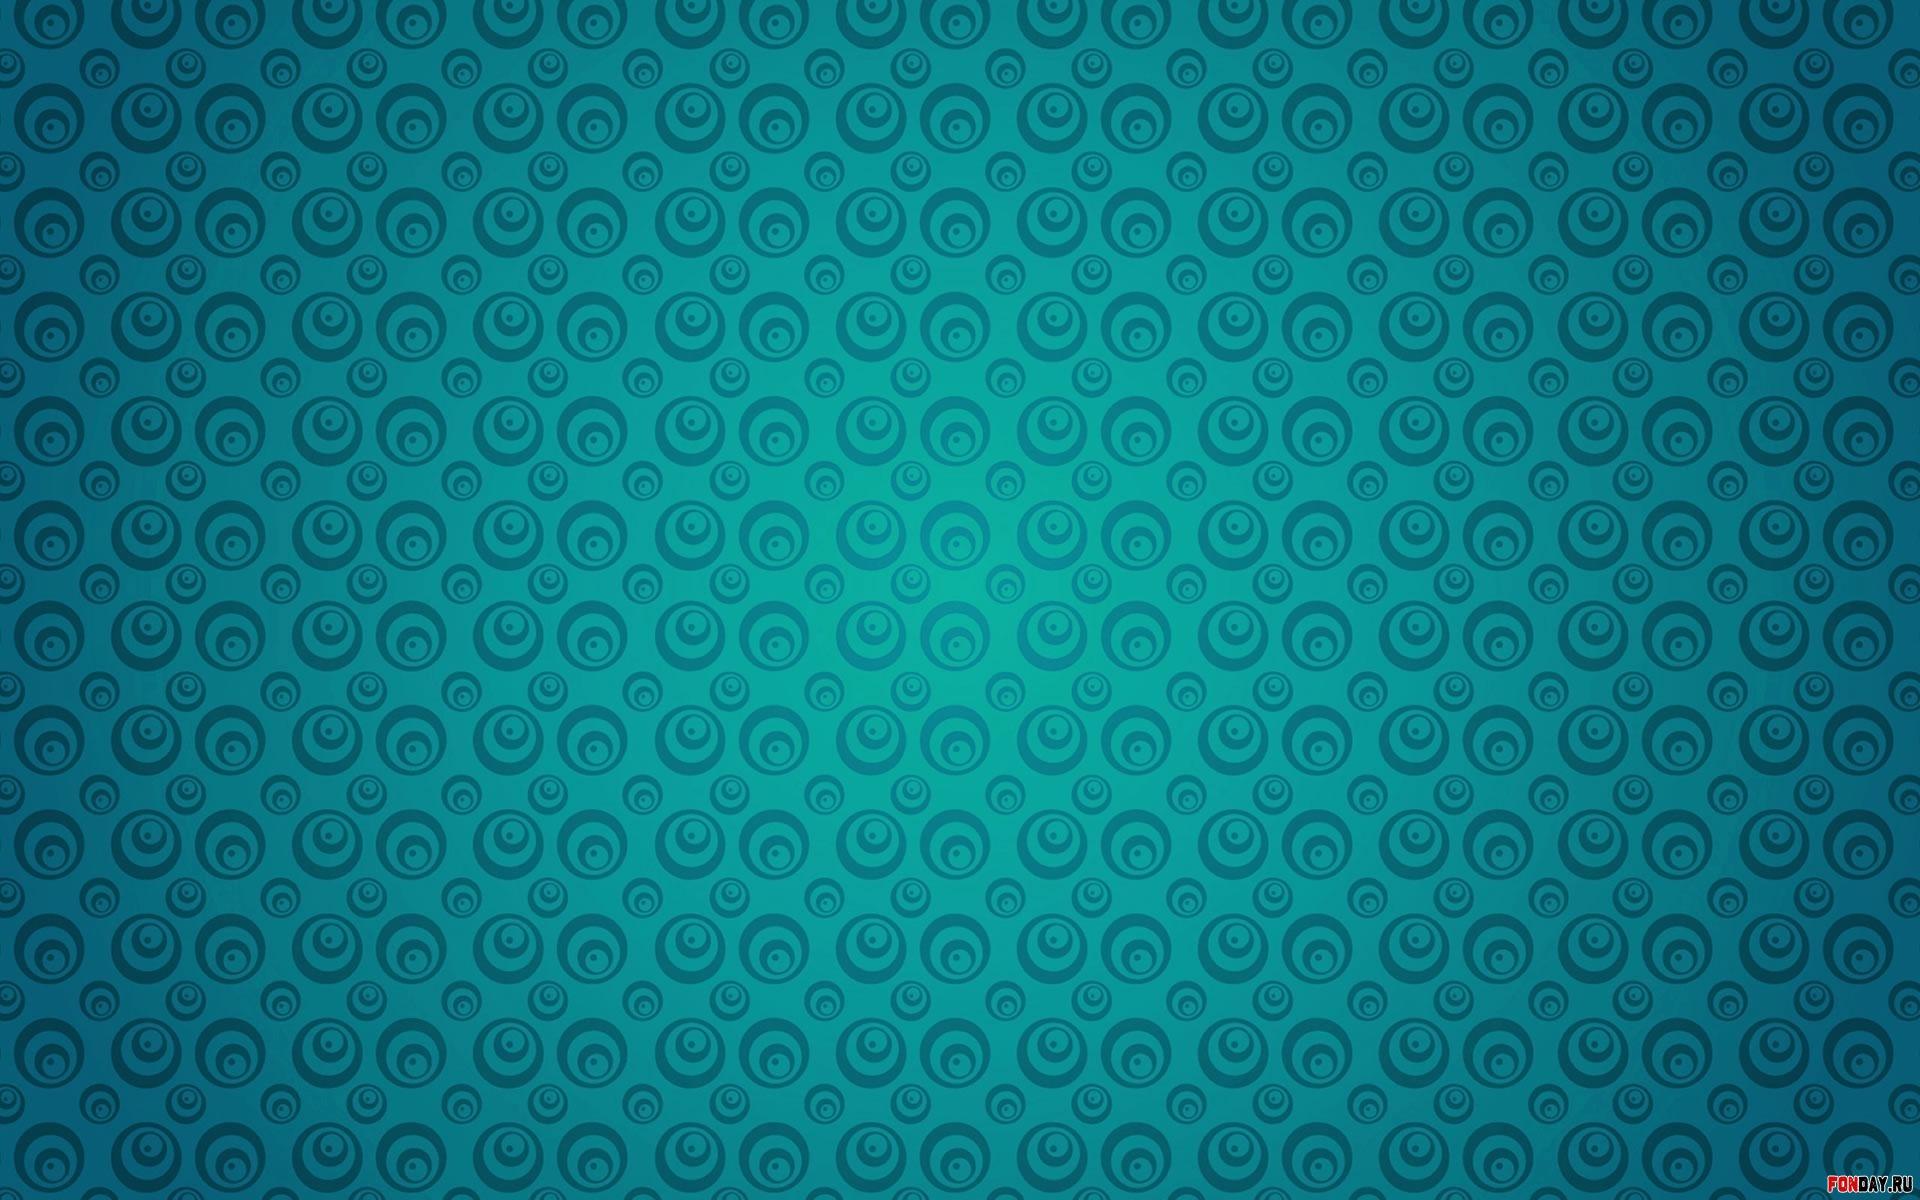 [Resim: pattern_texture1156x7s3o.jpg]